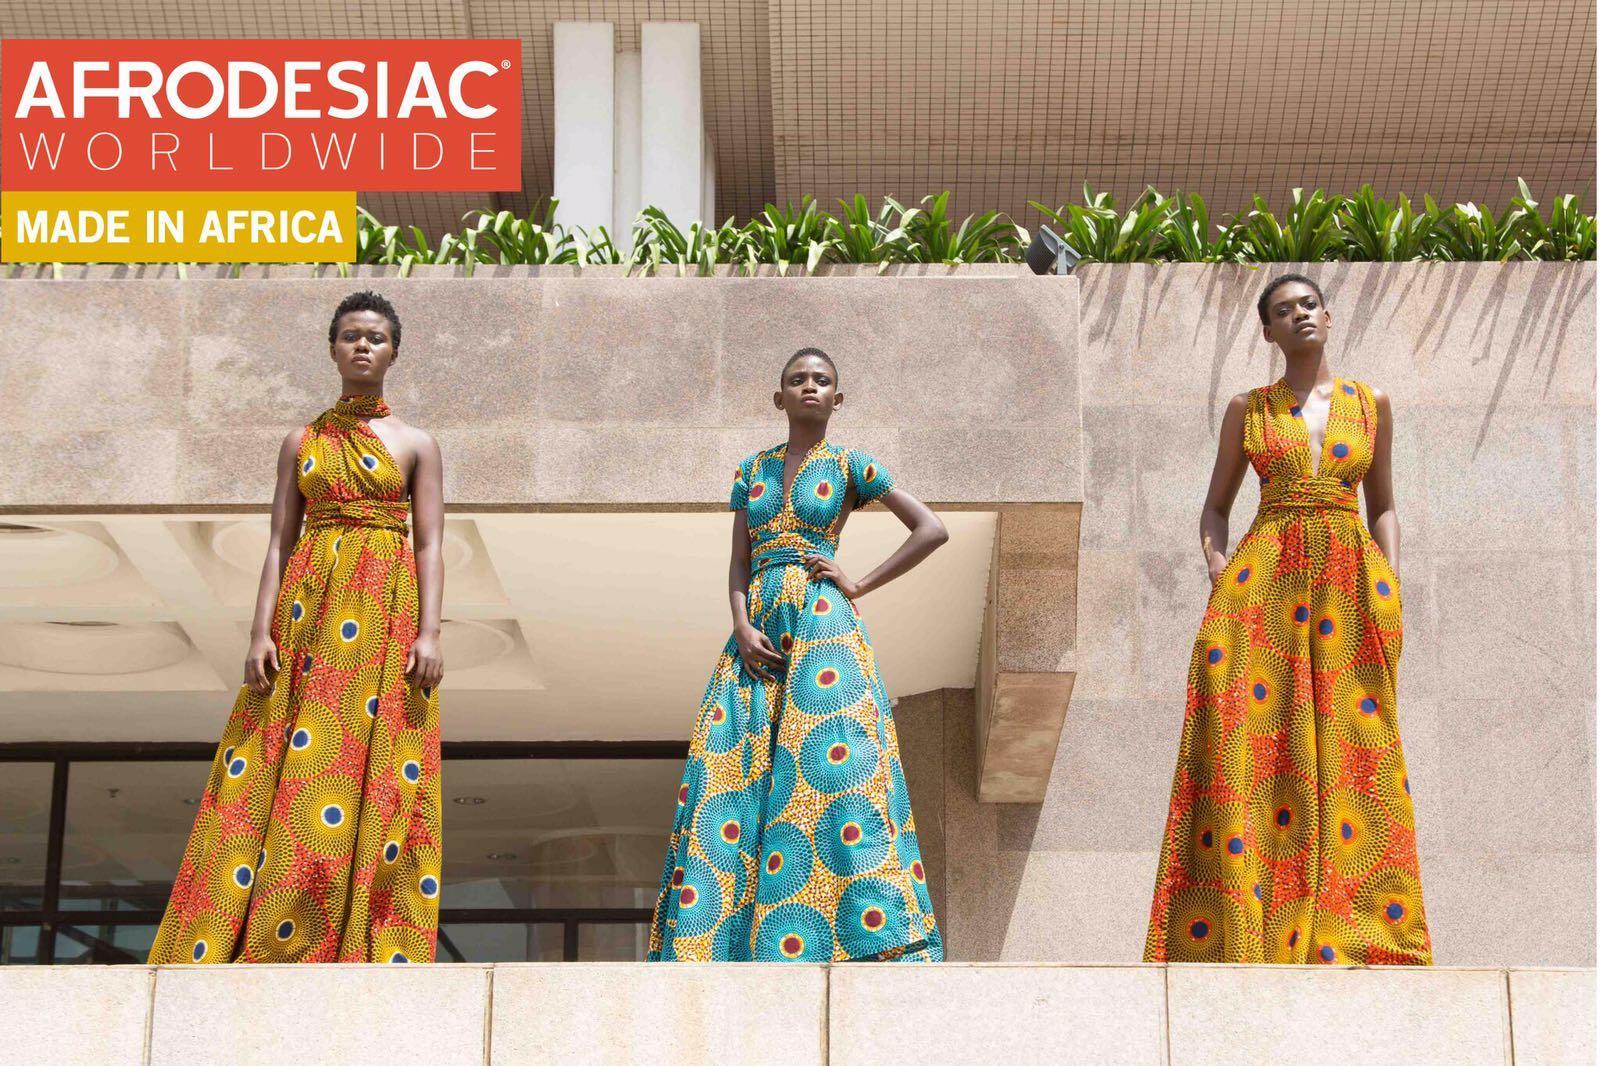 Fashion Design, Afrodesiac World Wide